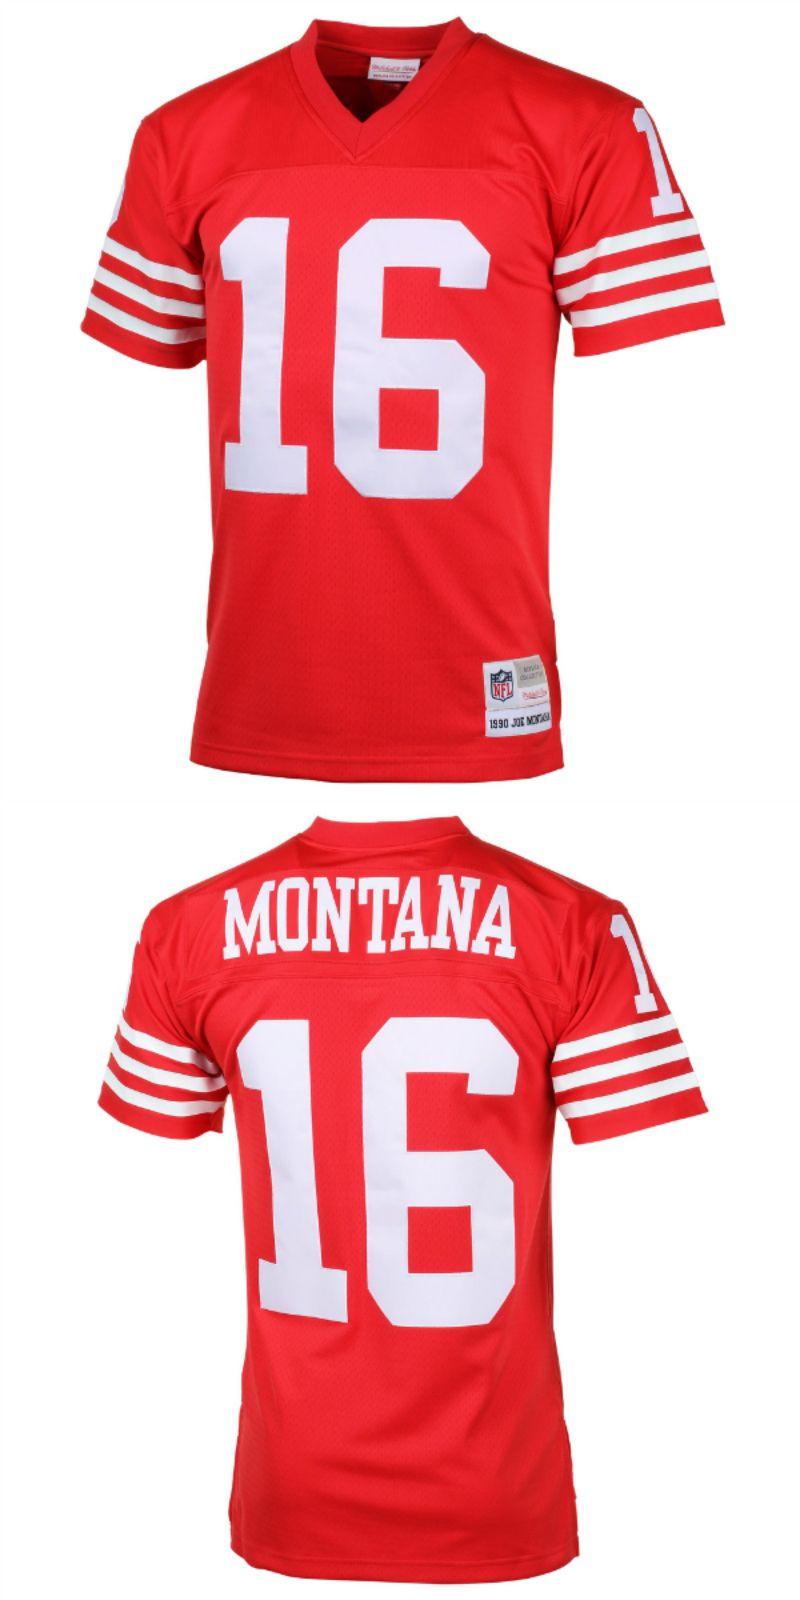 best website 661e3 12822 UP TO 70% OFF. Joe Montana San Francisco 49ers Mitchell ...